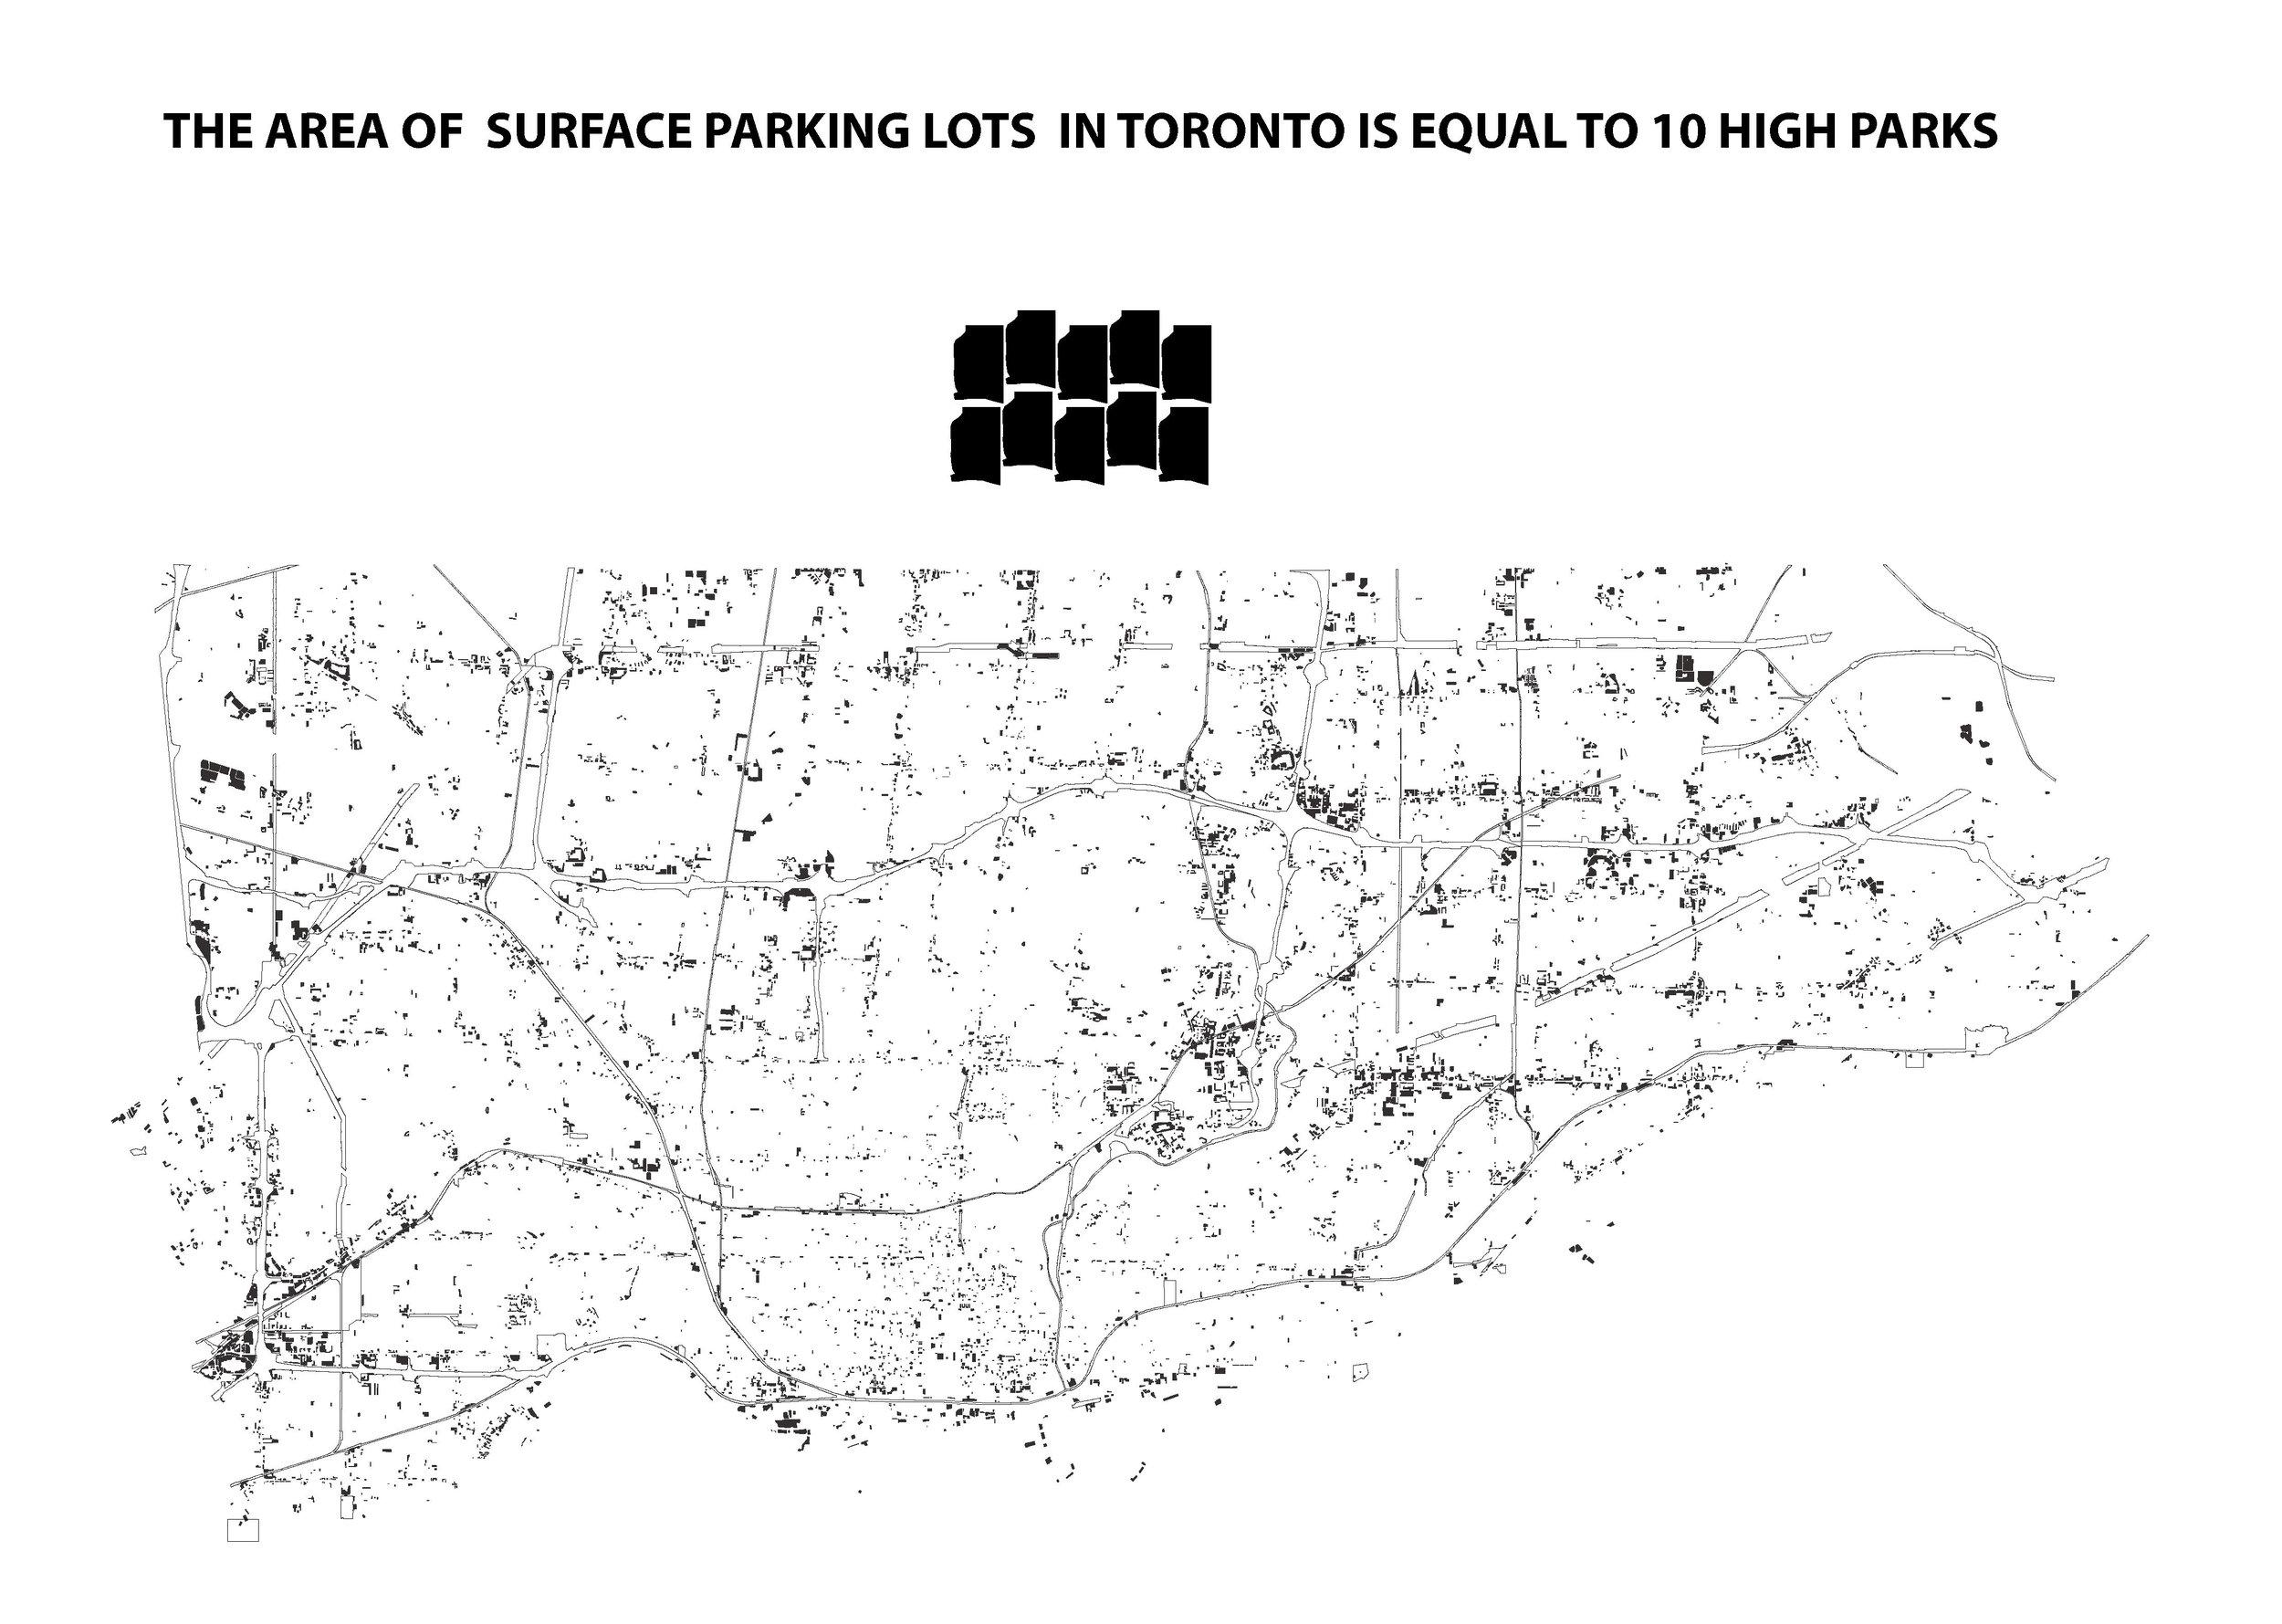 10 high parks.jpg